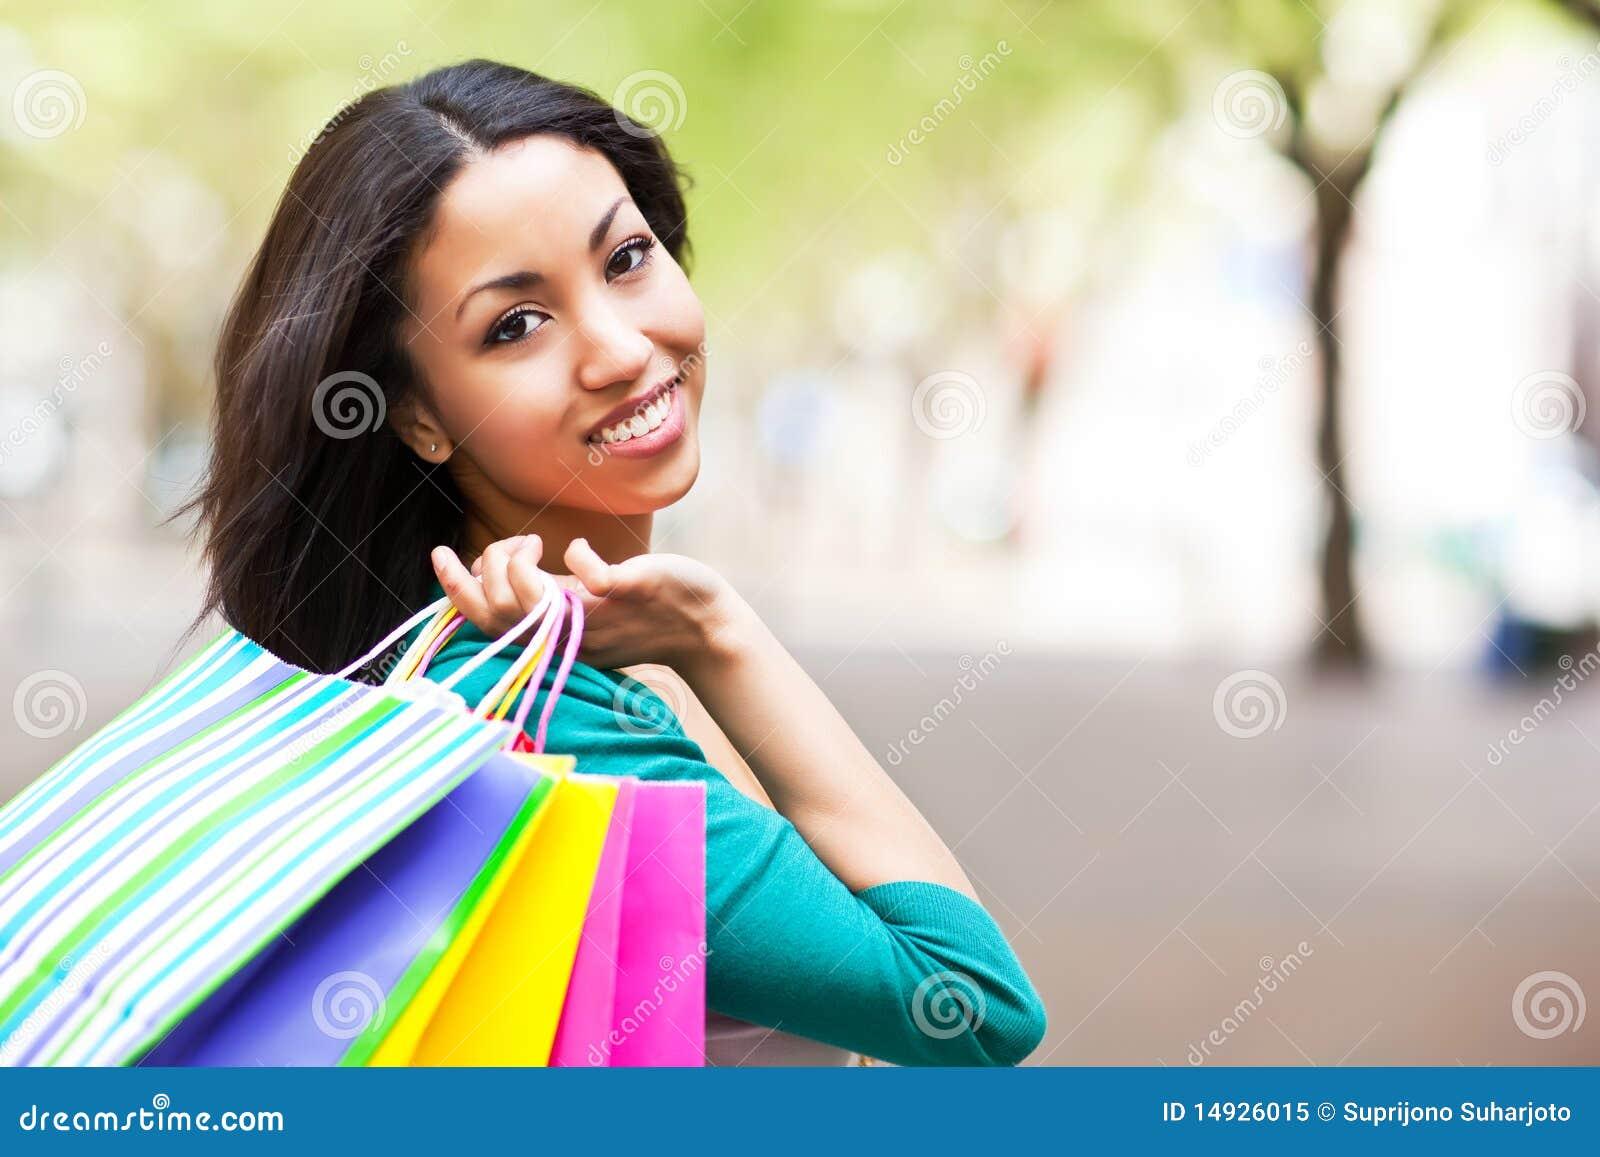 Black Woman Shopping Royalty Free Stock Photo - Image